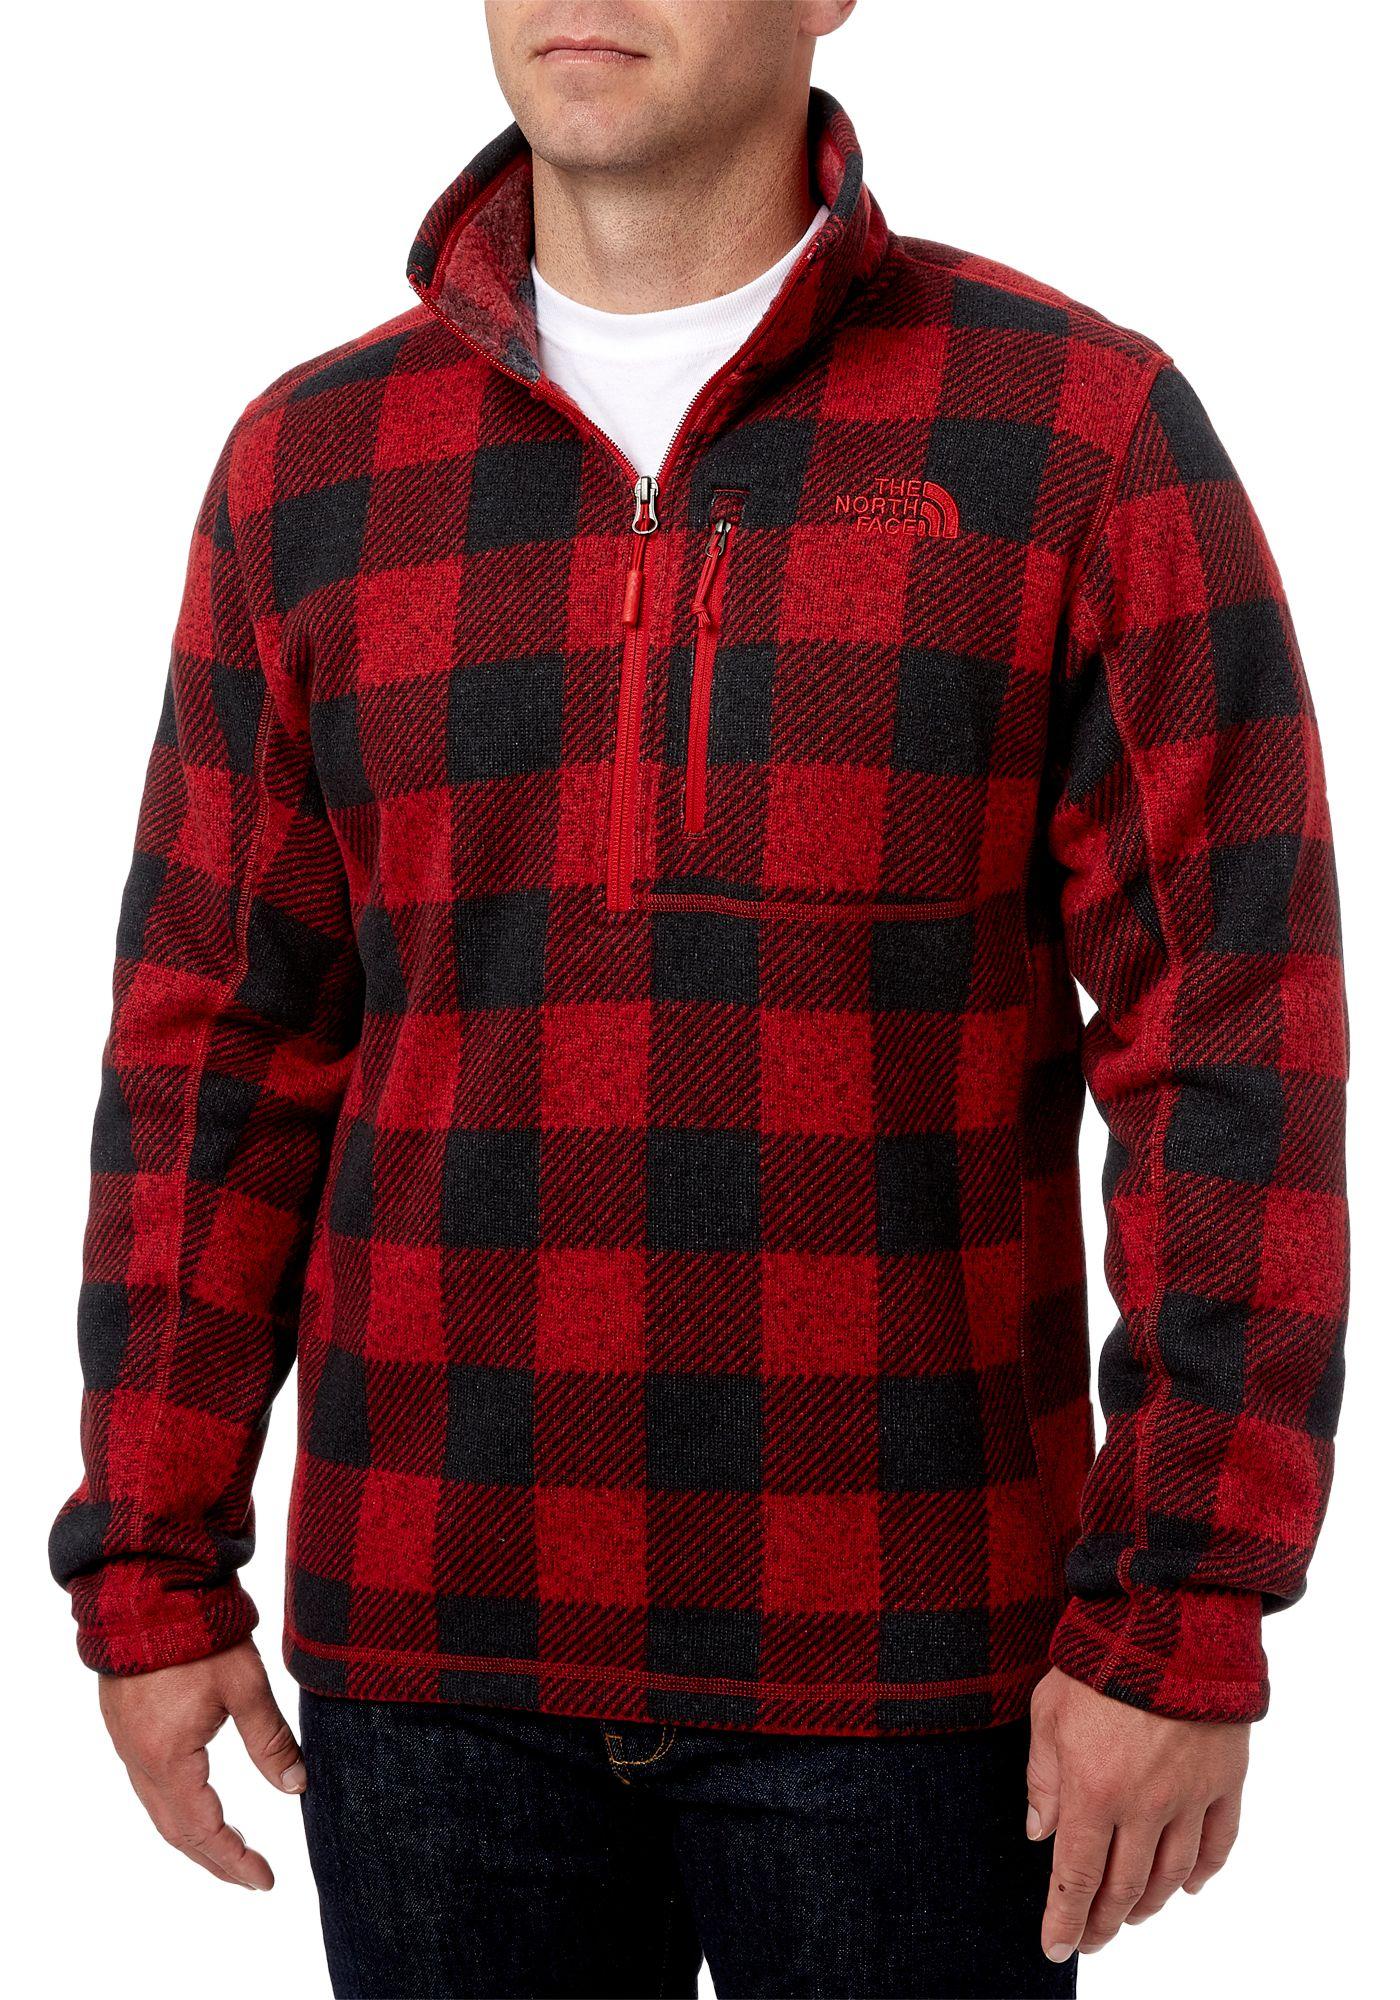 The North Face Men's Novelty Gordon Lyons 1/4 Zip Fleece Pullover